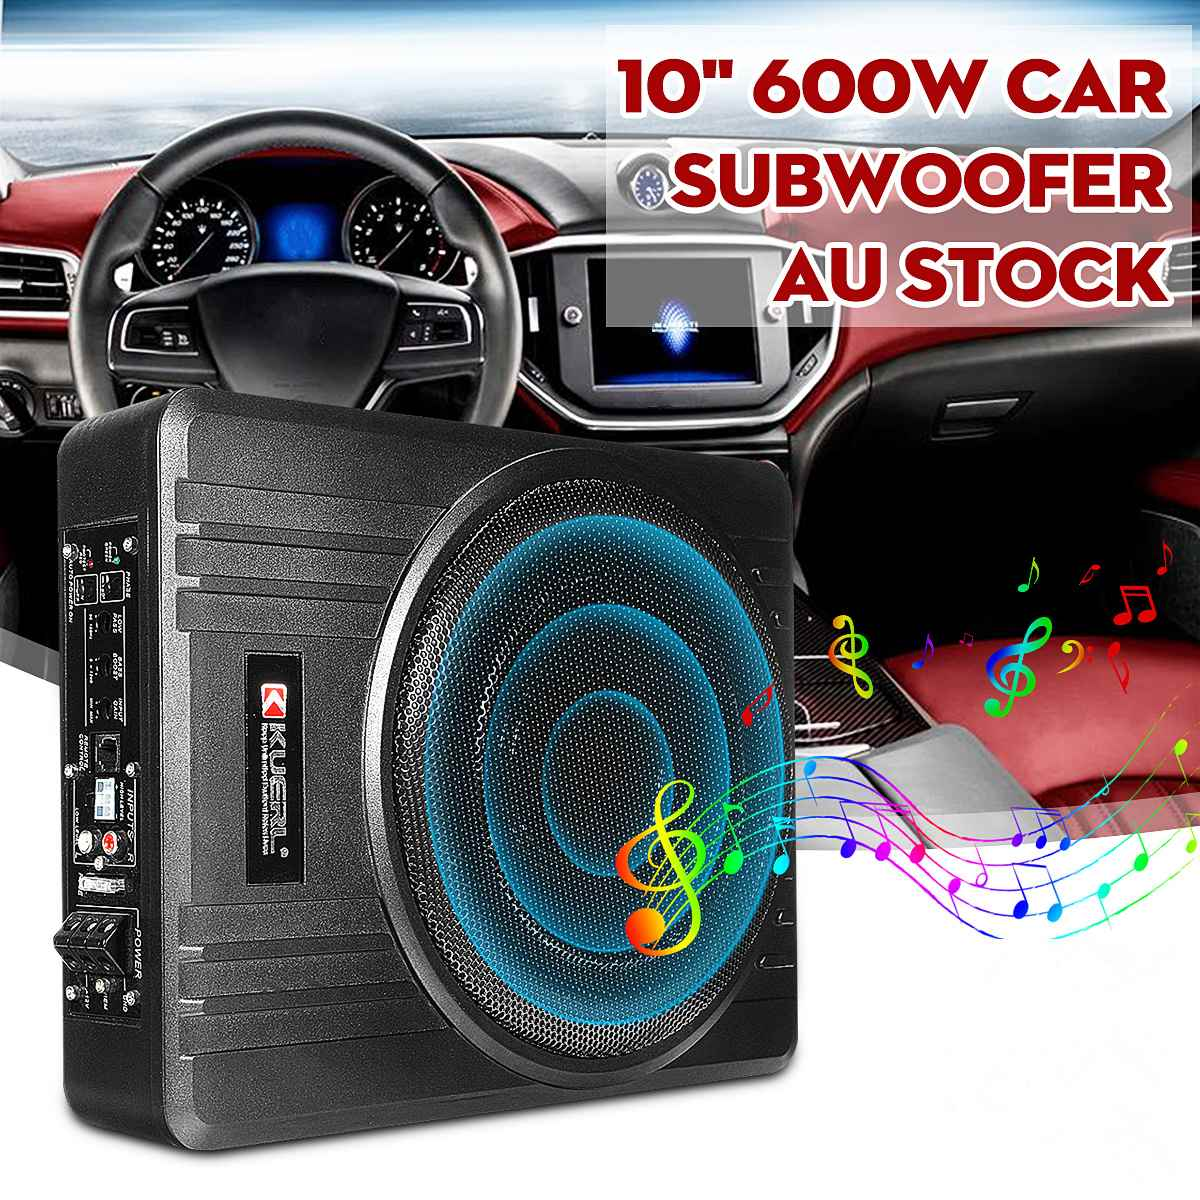 Speaker Subwoofers Bass-Amplifier Car-Audio Under-Seat Slim 10inch 600W